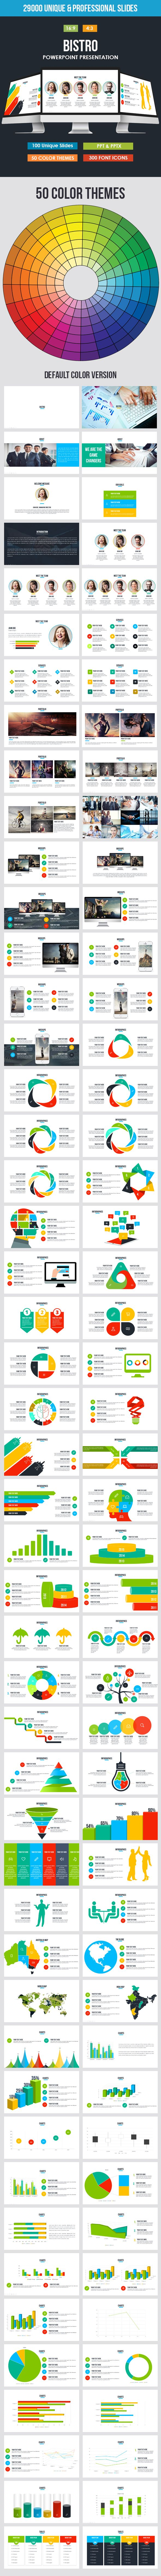 Bistro - Multi-purpose Powerpoint Template